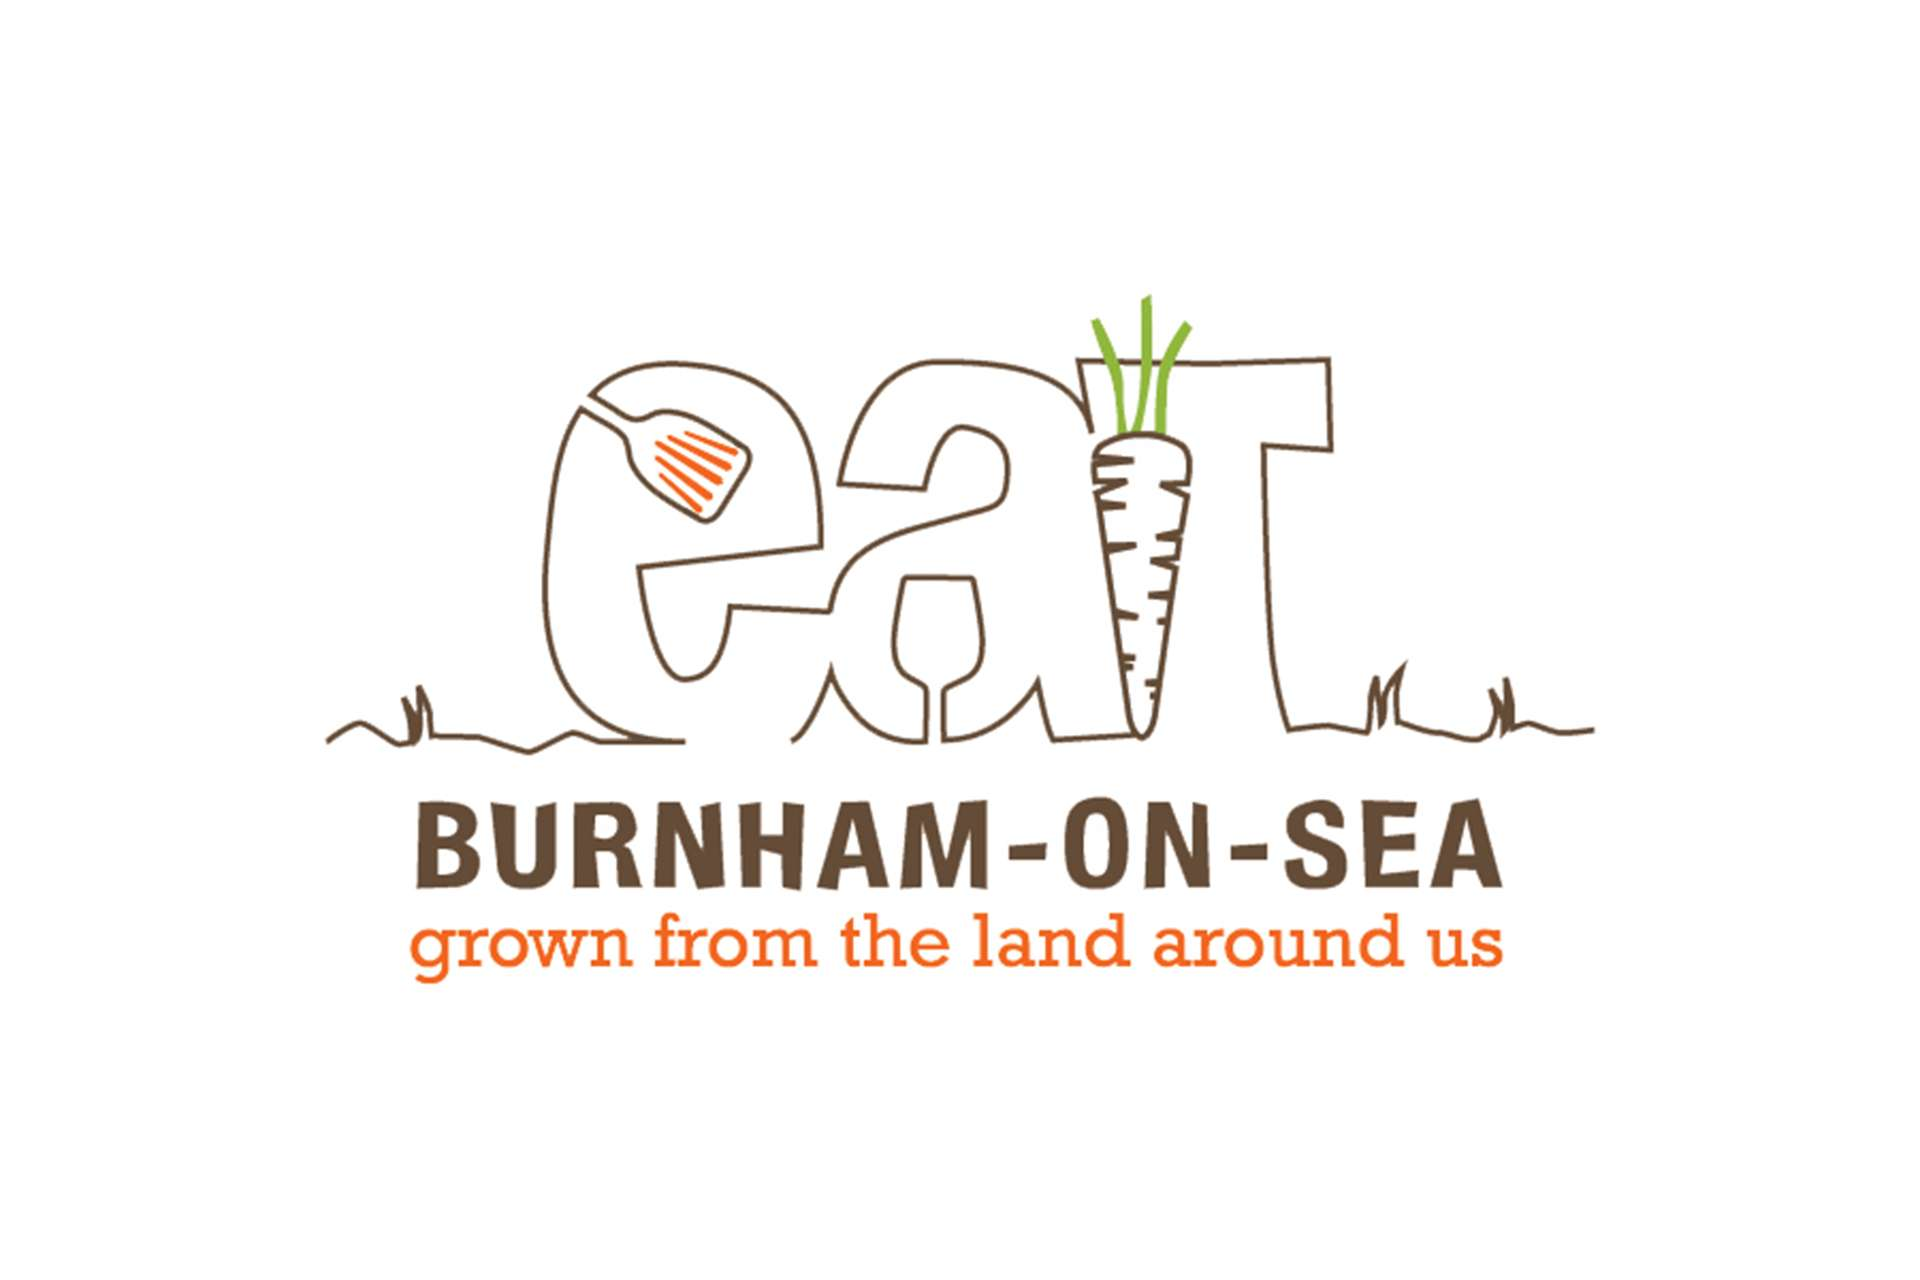 Eat Festivals Food Logo Design, Burnham-on-Sea, Somerset